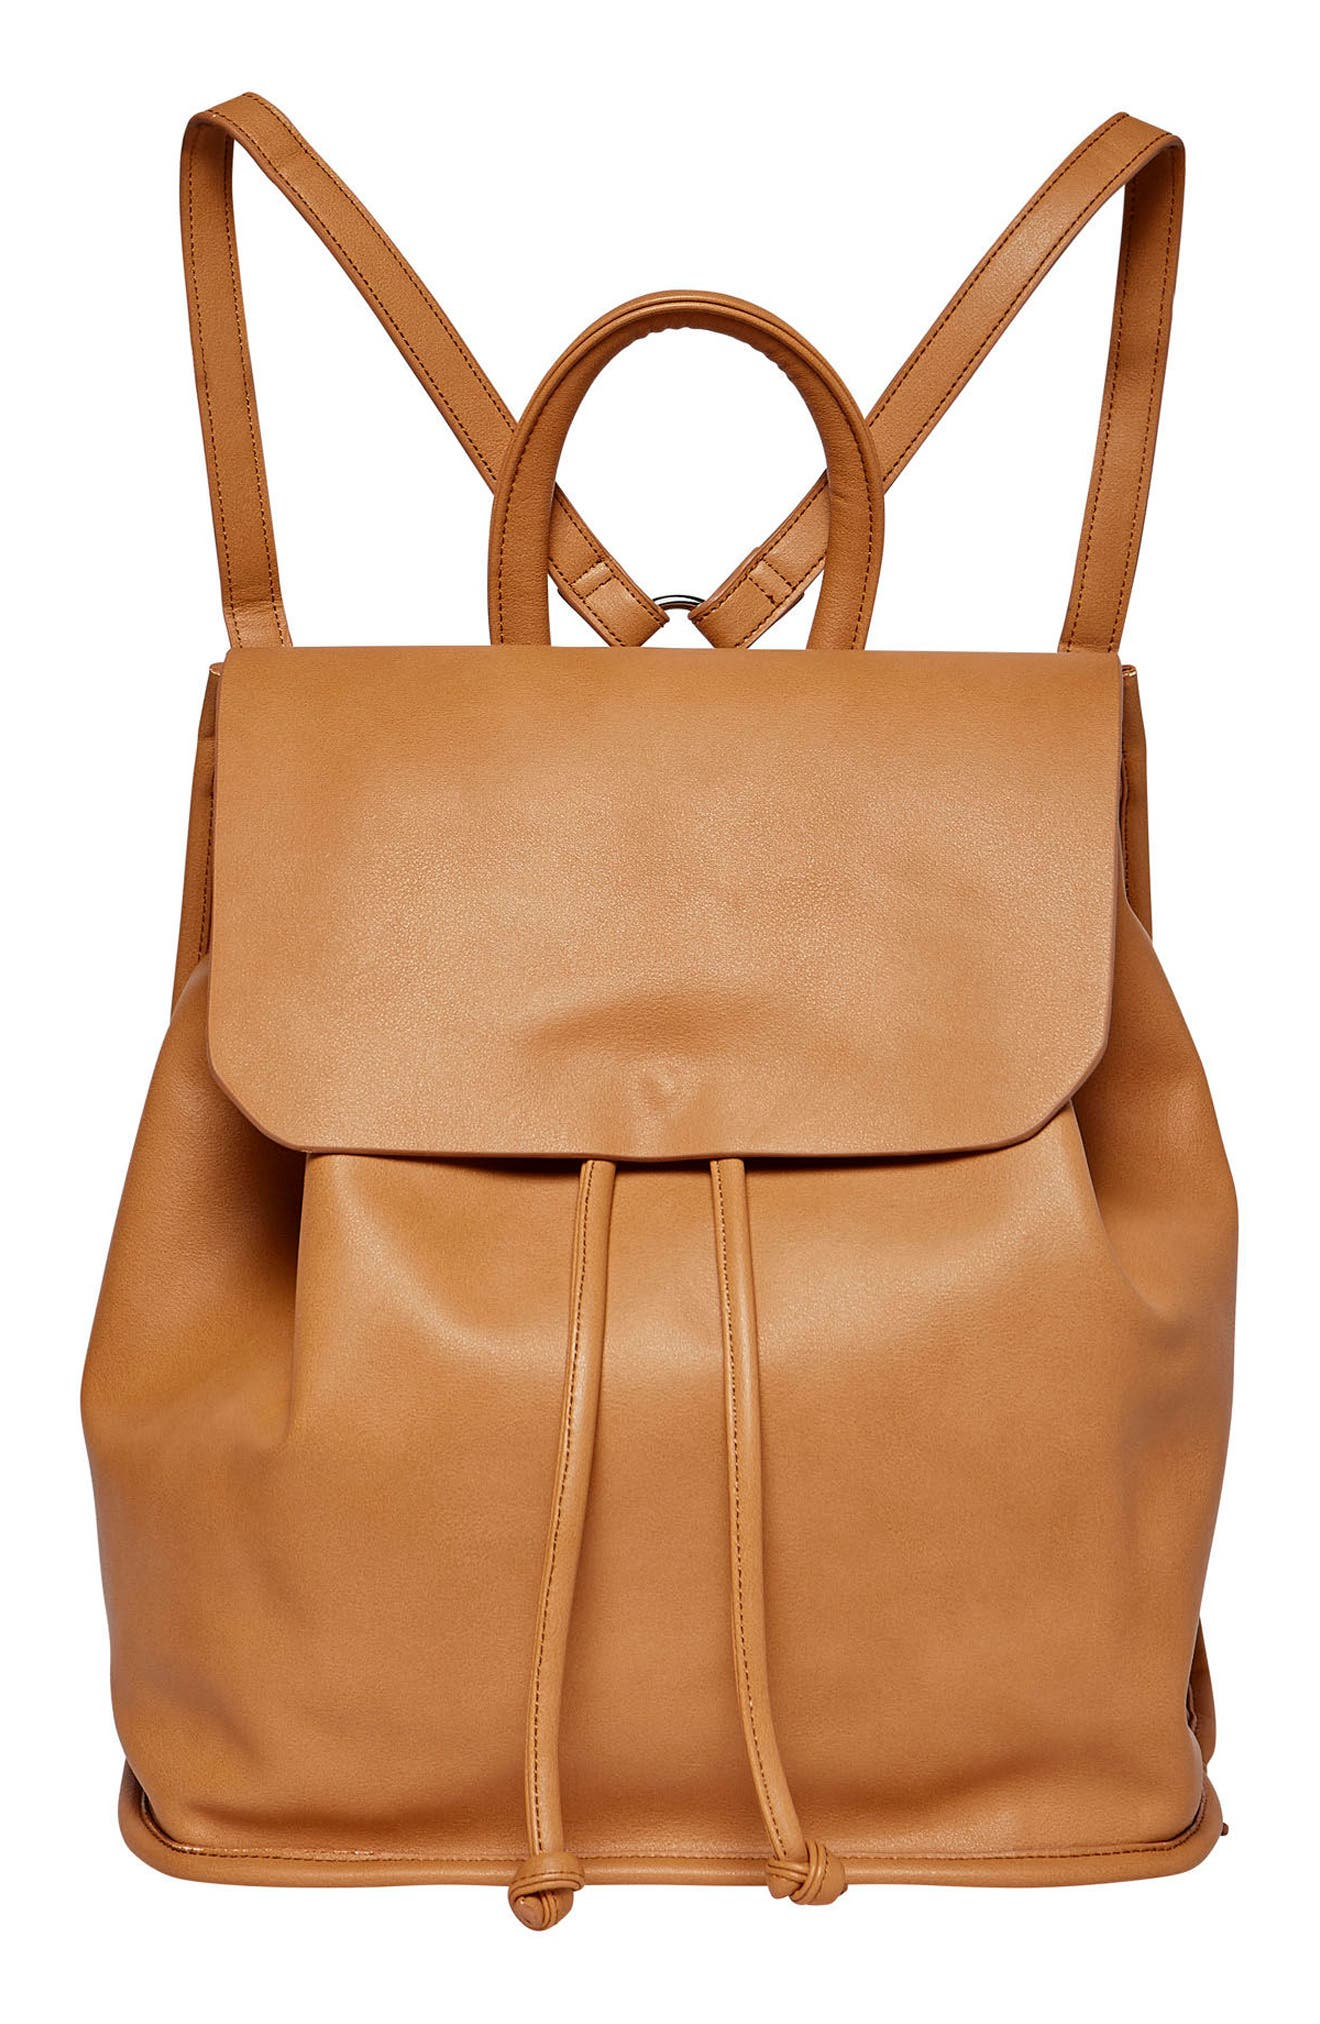 URBAN ORIGINALS Midnight Vegan Leather Flap Backpack, Main, color, 200